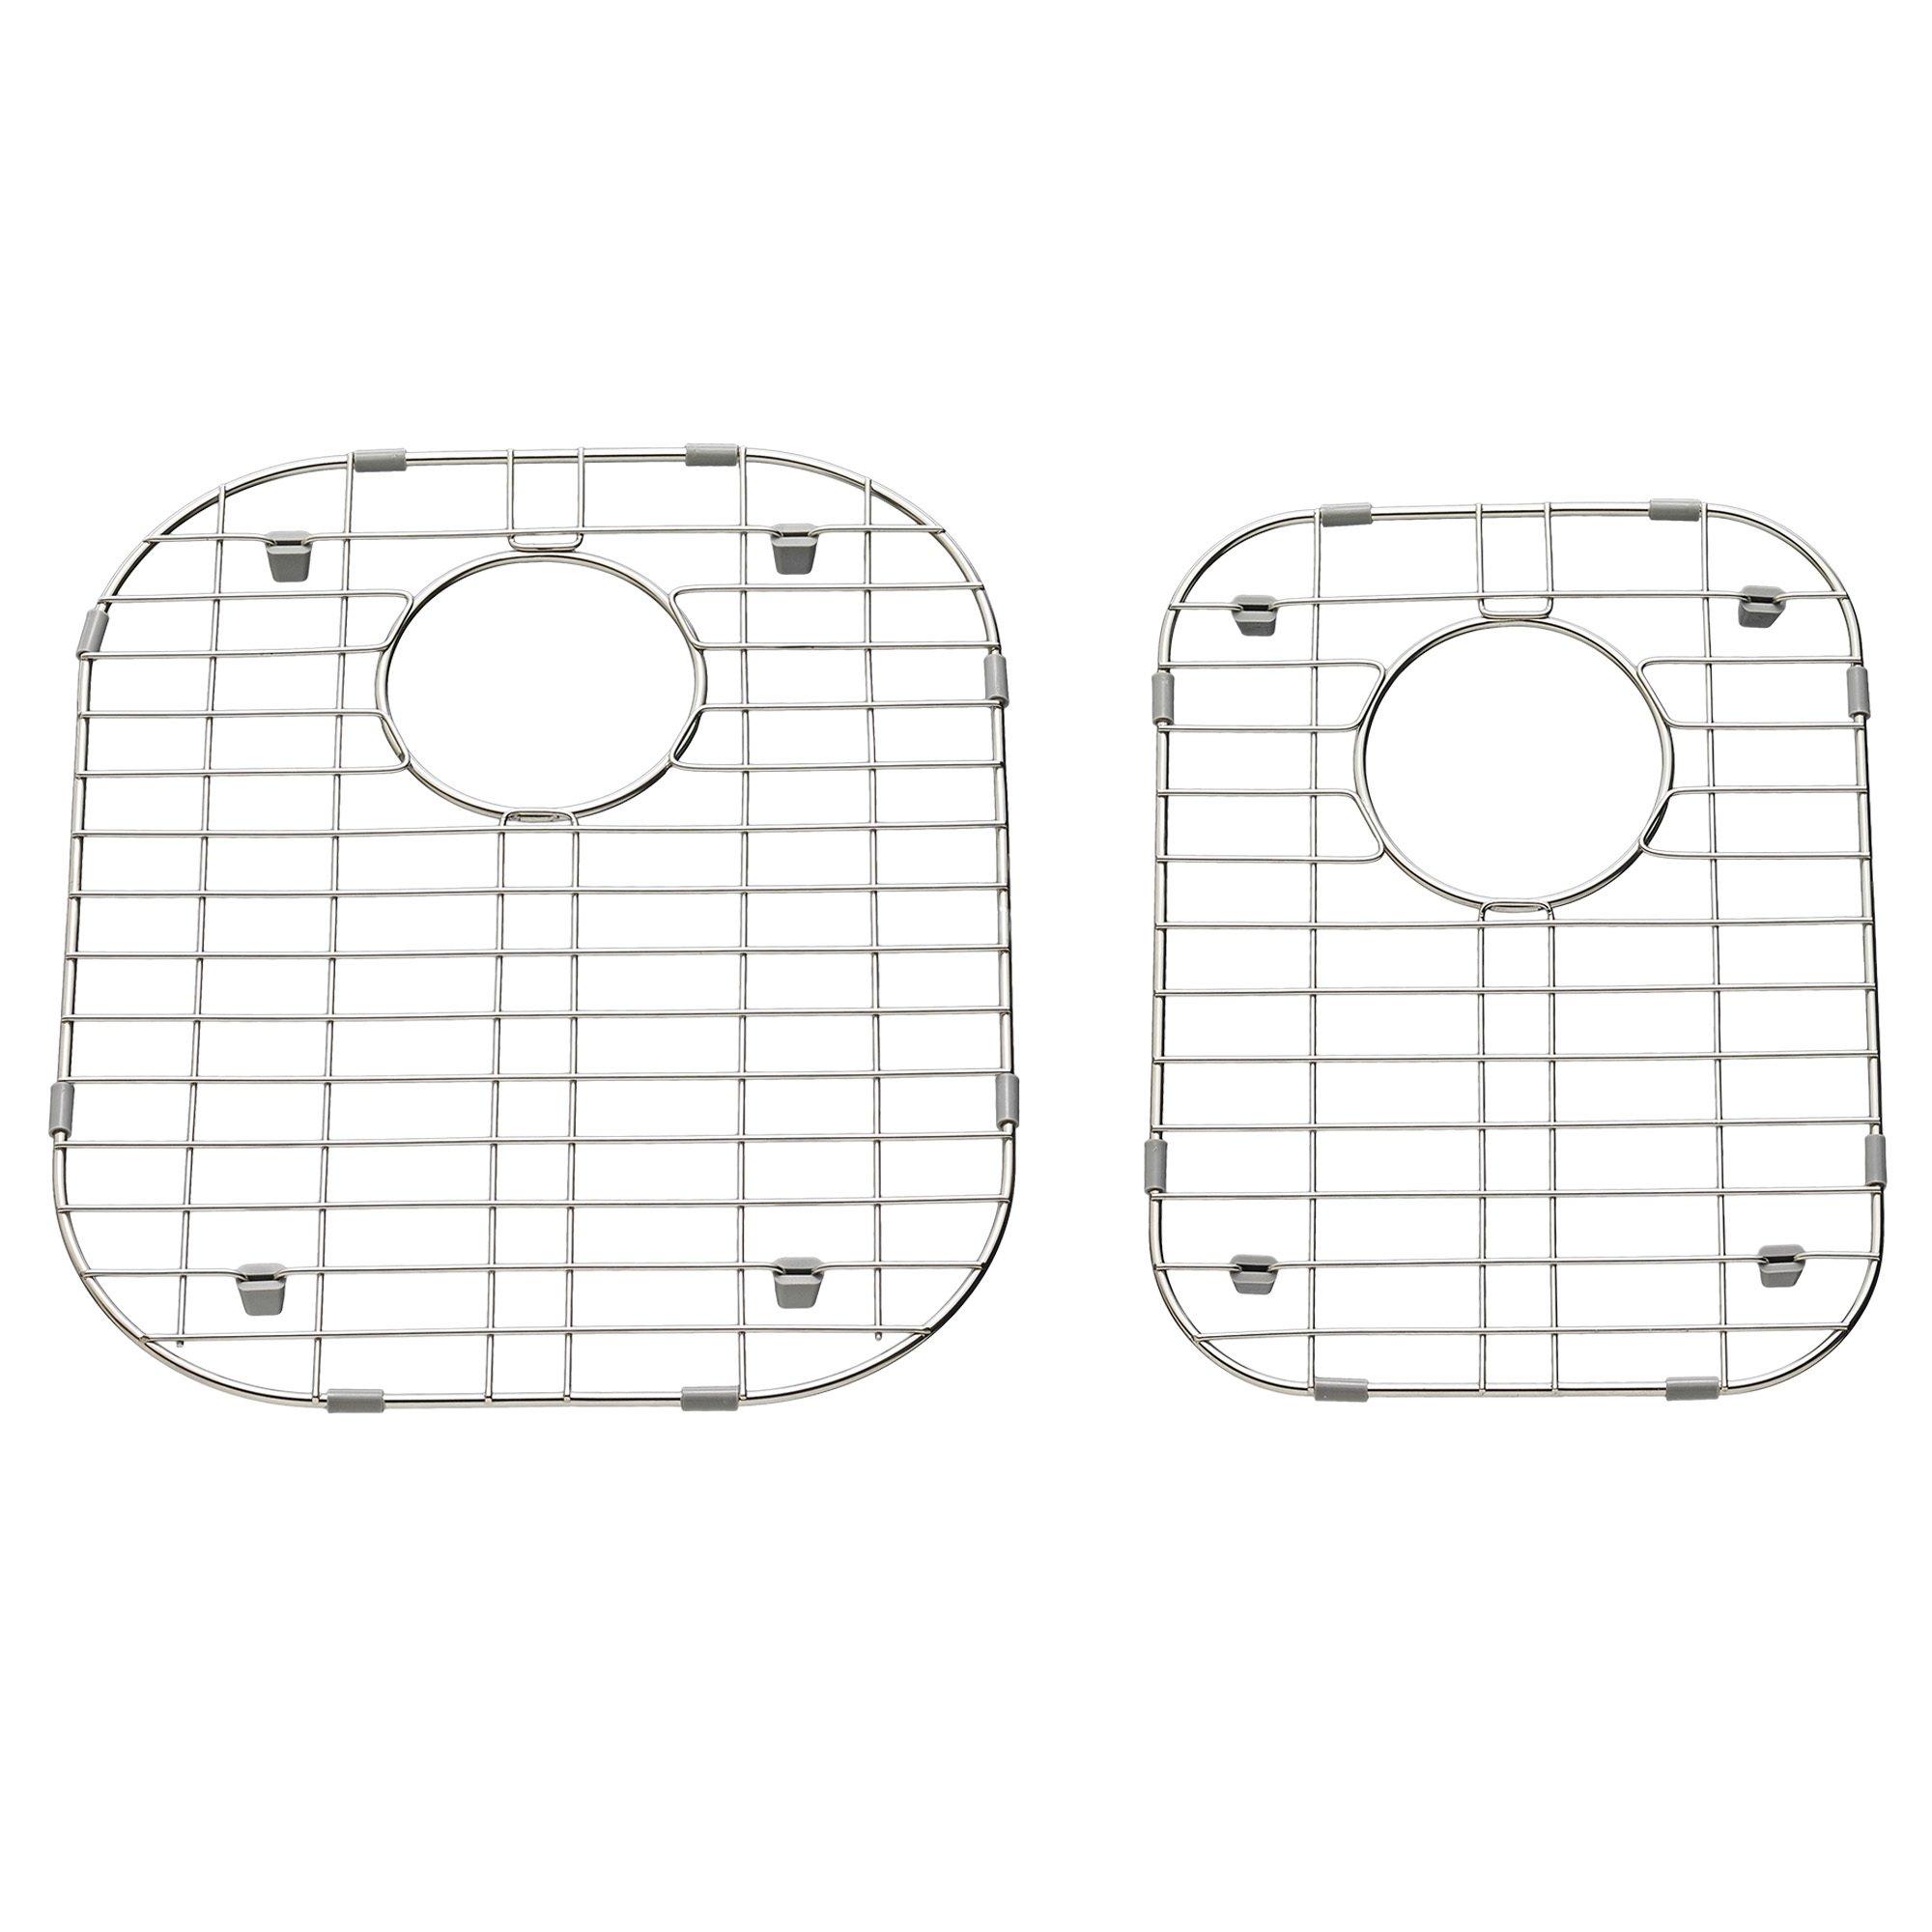 American Standard 7433000.075 2-Pack 13.39-in x 16.06-in Sink Grids, Stainless steel